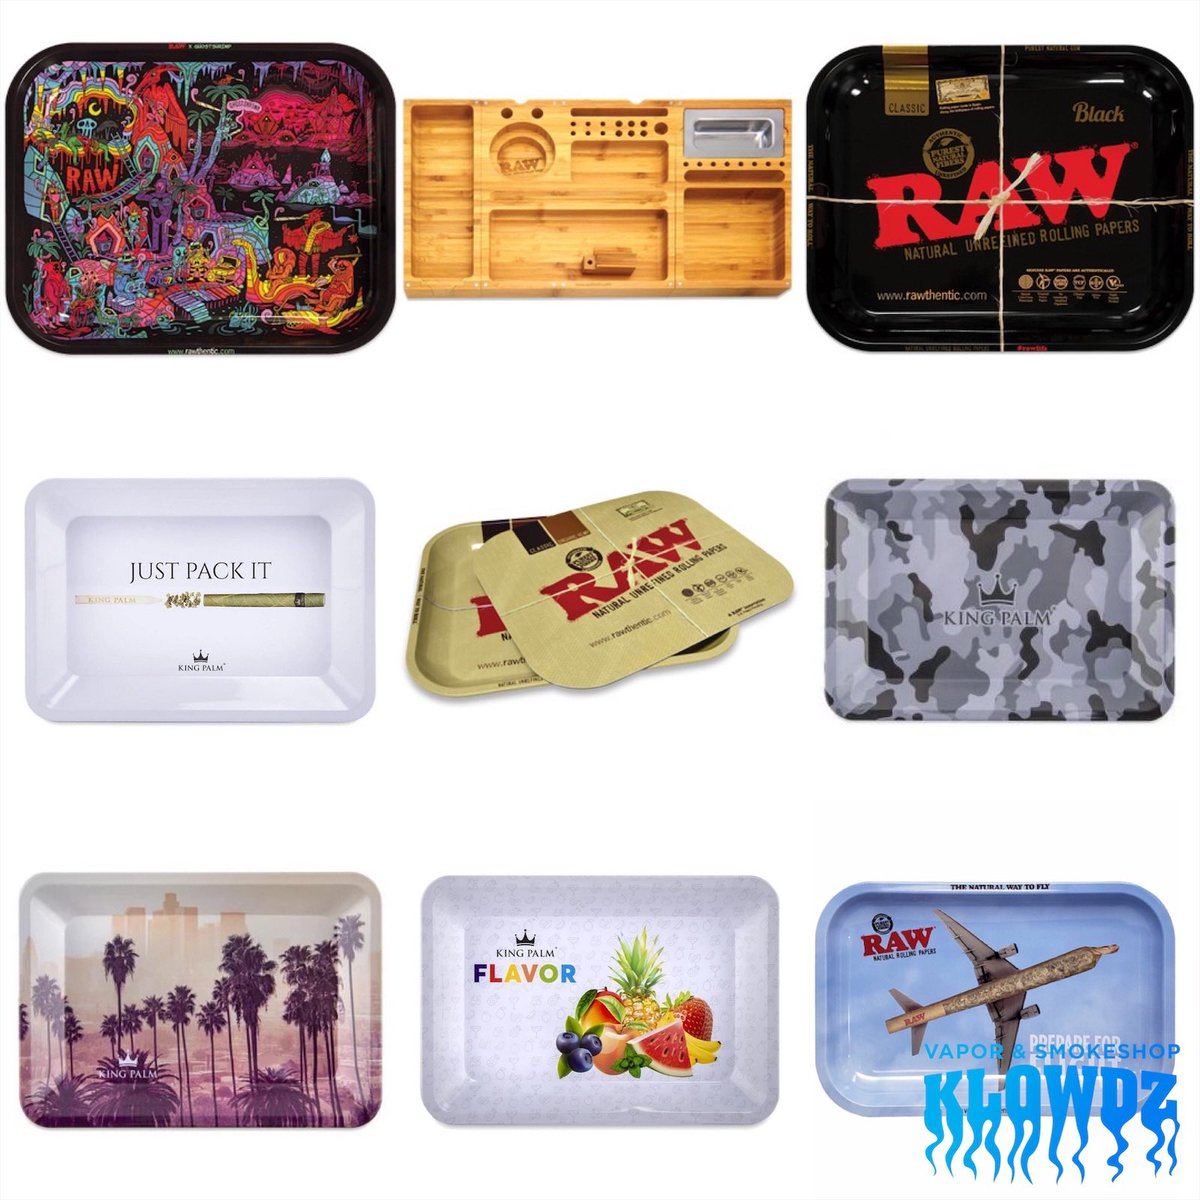 Major restock and lots of new RAW and King Palm rolling trays!  #mckinneytx #mckinneytexas #smoke #kush #420 #weshouldsmoke #dabs #smoker #420lyfe #glassart #smokeshop #dablife #concentrates #dabstagram #bongs #glasspipes #bongrips #vape #vapor #vapefam #vapestagrampic.twitter.com/hkRO35m0mY – at KLOWDZ Vapor & Smokeshop